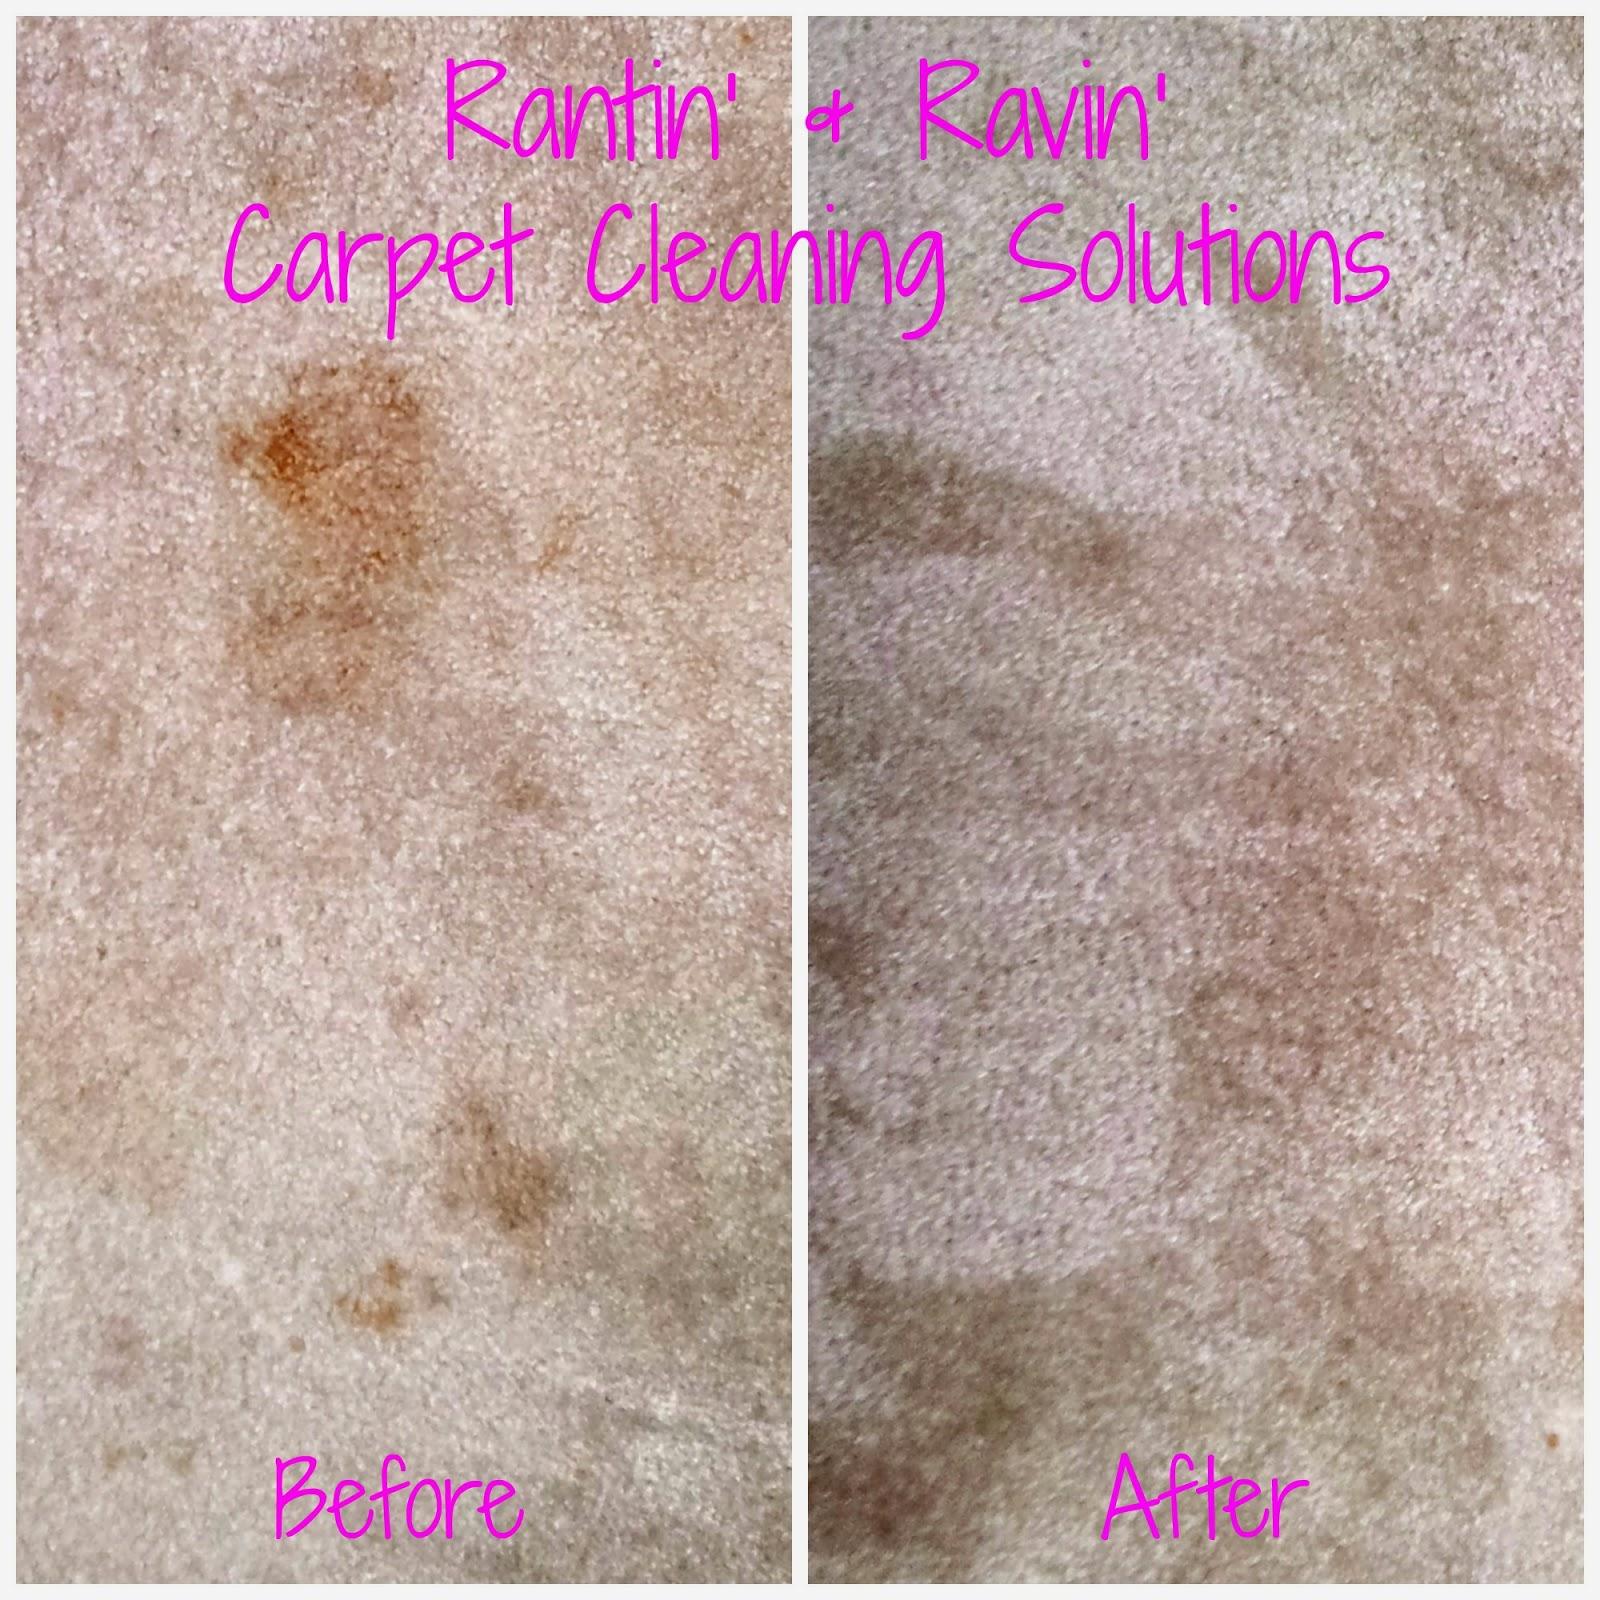 Rantin' & Ravin': CARPET CLEANING!!!